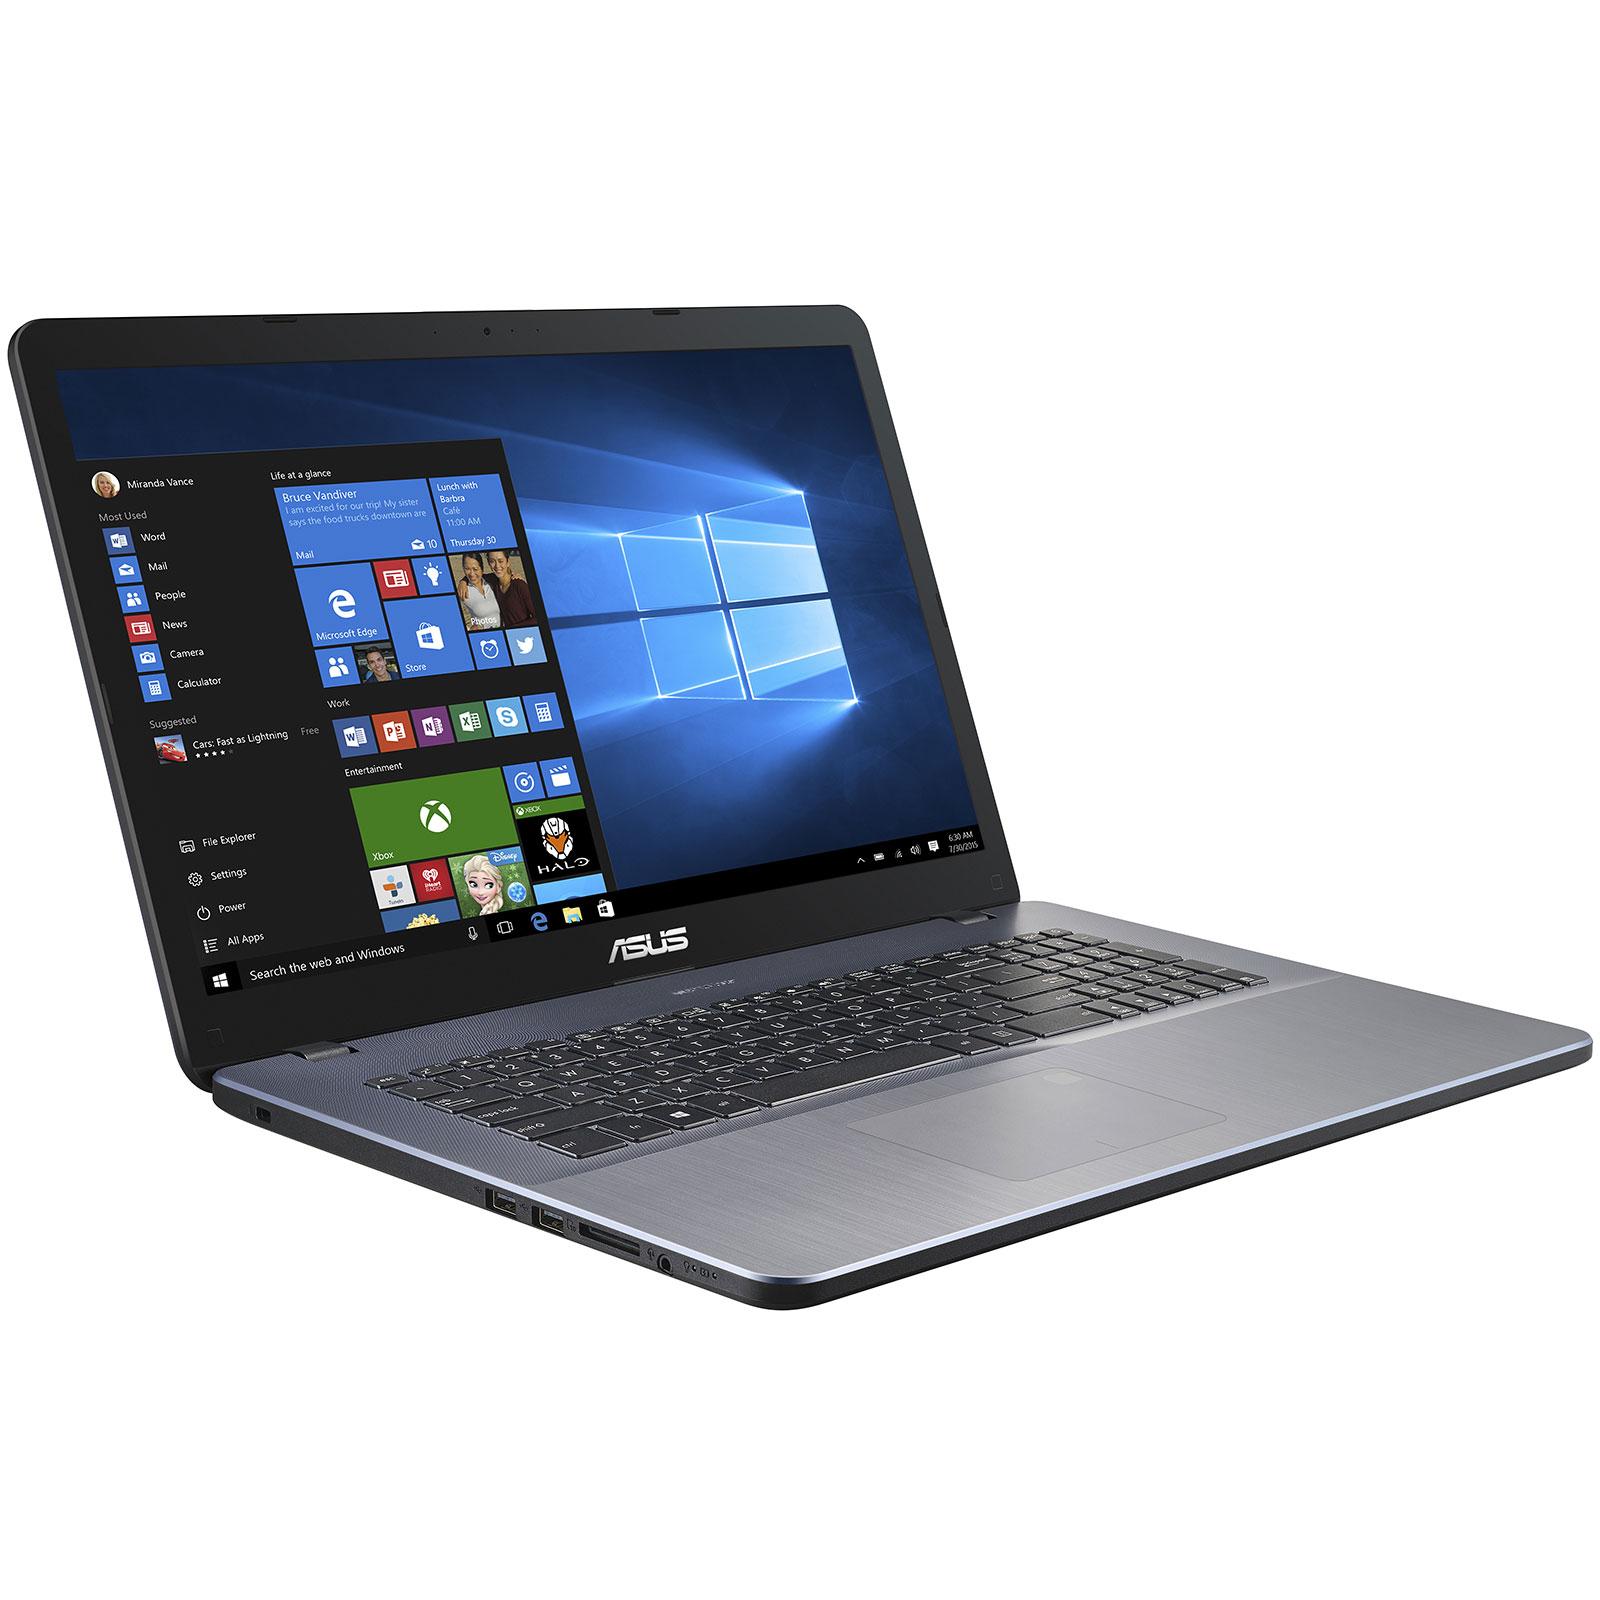 "PC portable ASUS R702UA-GC613T Intel Core i5-8250U 8 Go SSD 128 Go + HDD 1 To 17.3"" LED Full HD Wi-Fi N/Bluetooth Webcam Windows 10 Famille 64 bits (garantie constructeur 2 ans)"